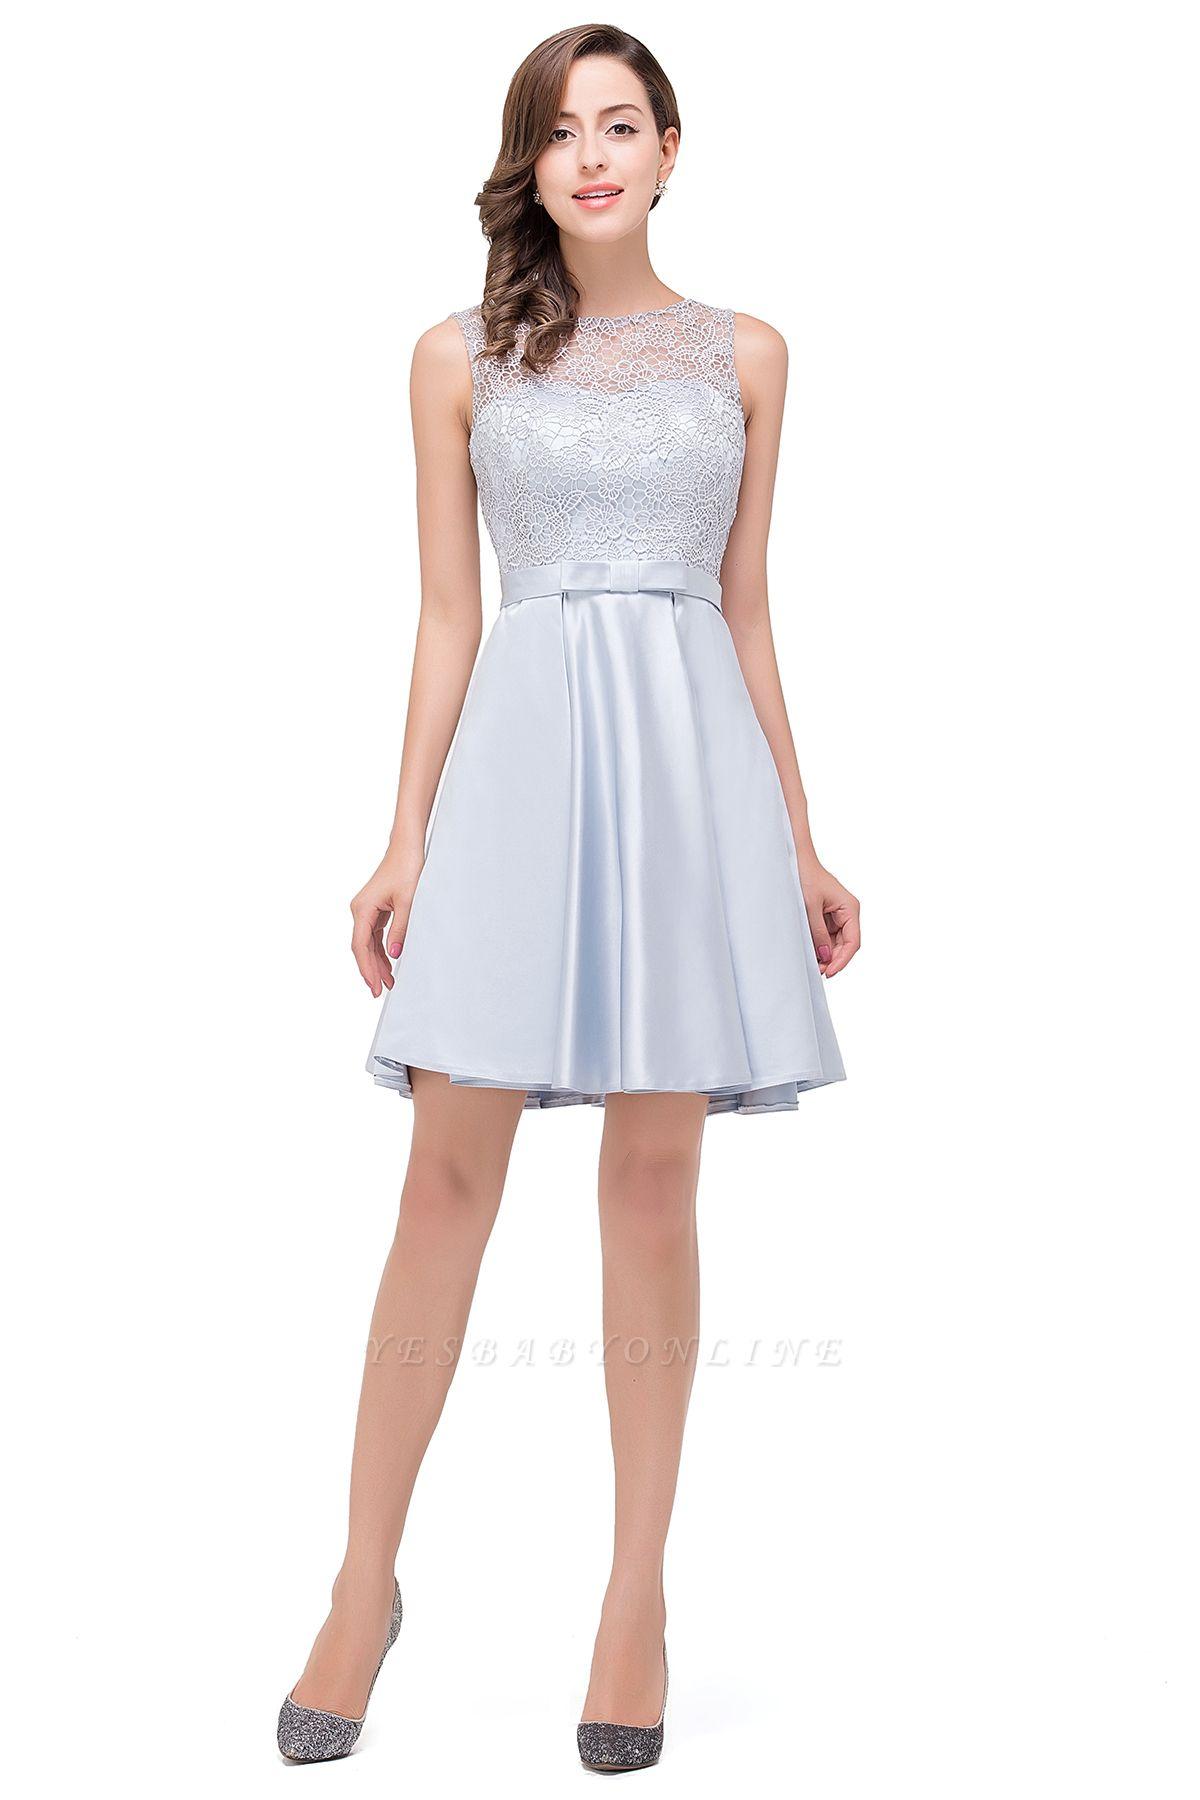 A-Line Knee Length Sleeveless Lace Short Prom Dresses